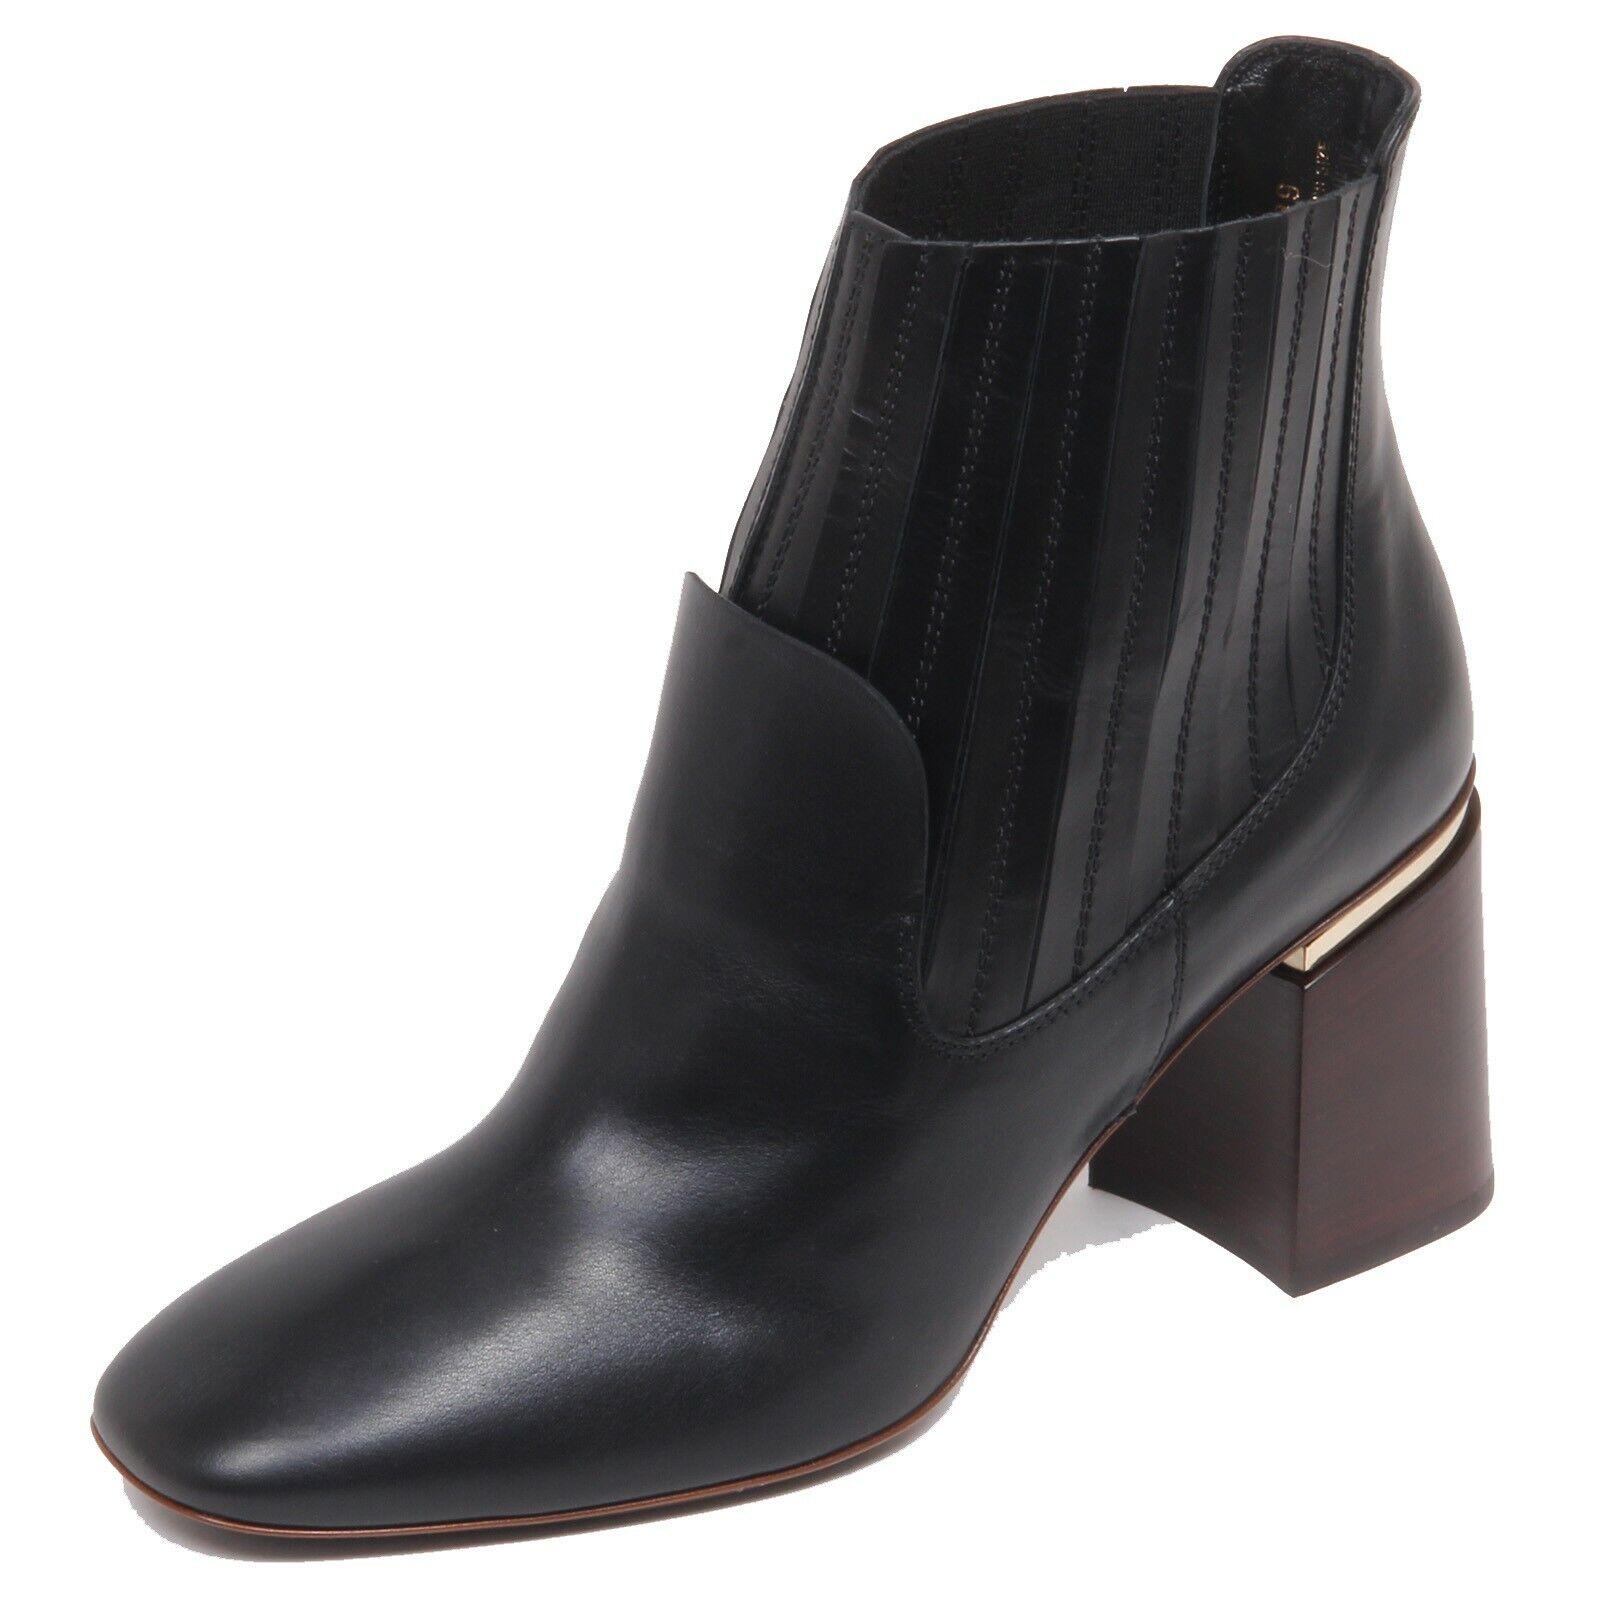 F5938 Tronchetto mujer Negro Bota Zapato Mujer TOD'S zapatos